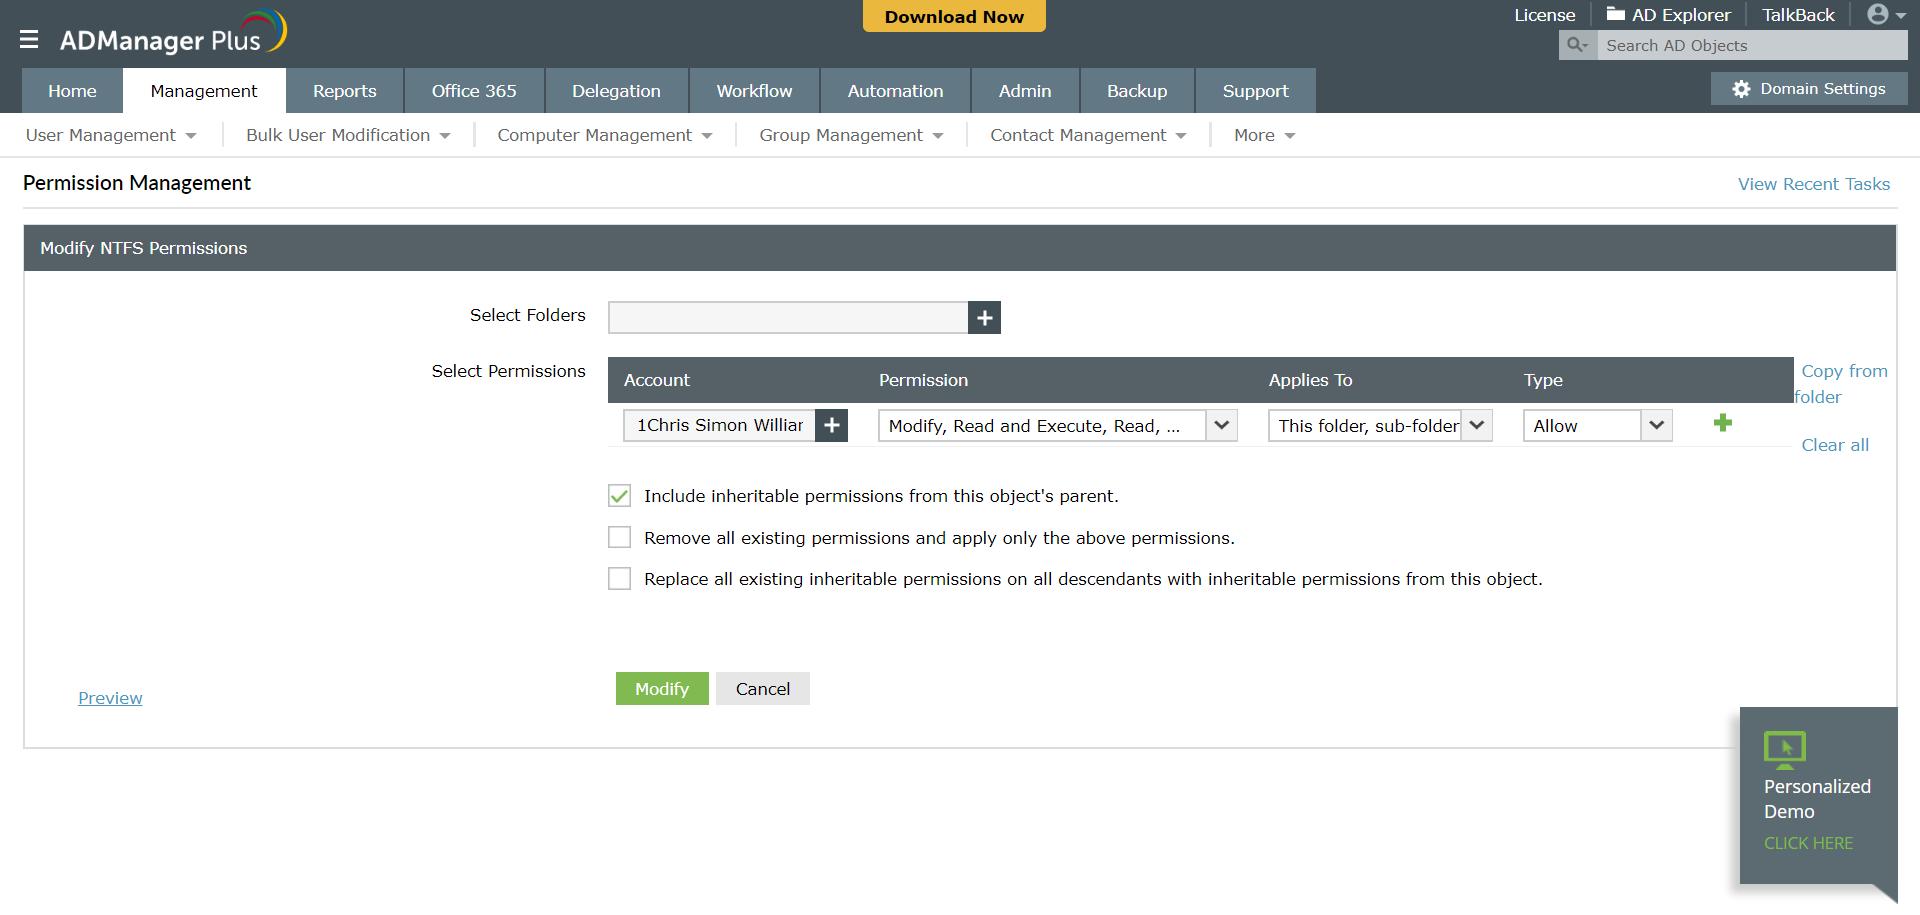 Set and modify folder permissions using ADManager Plus